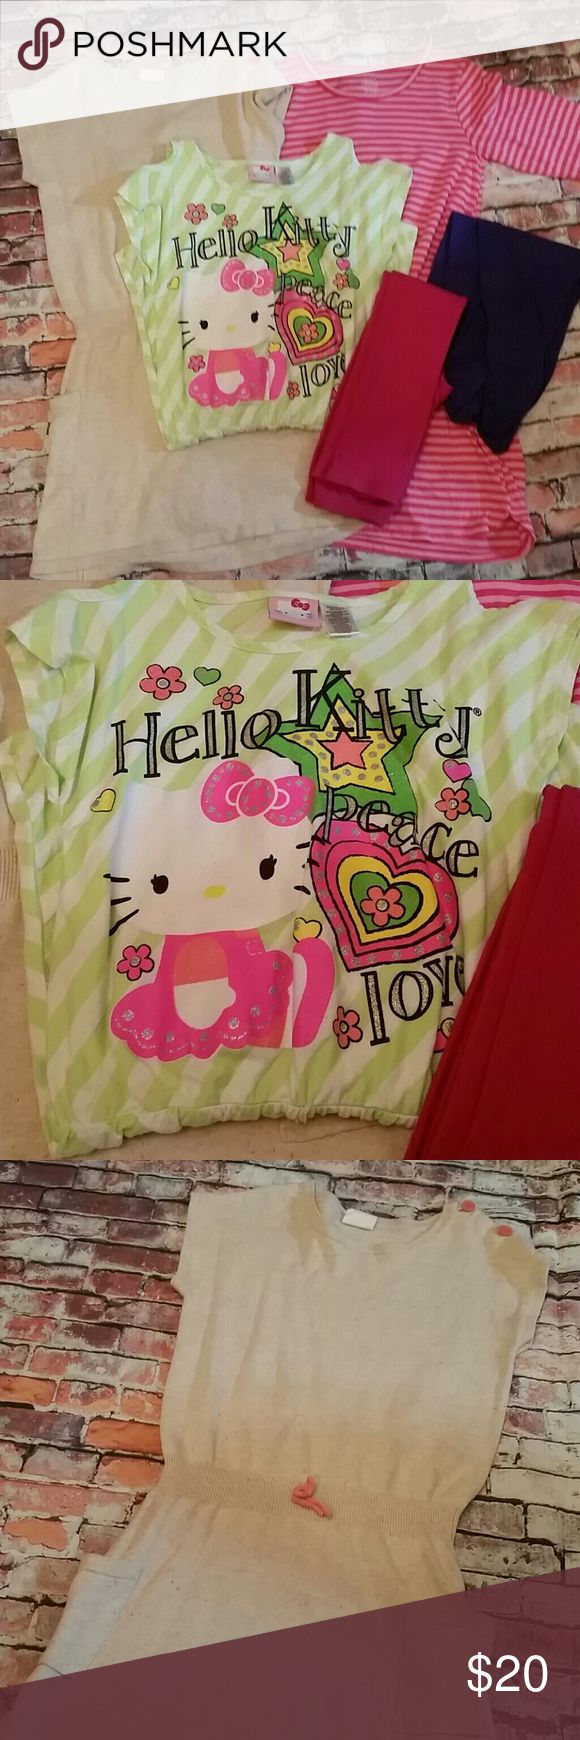 Skype hidden emoticons captain america - Bargain Box 2 Hello Kitty Crazy 8 Fg Girls 10